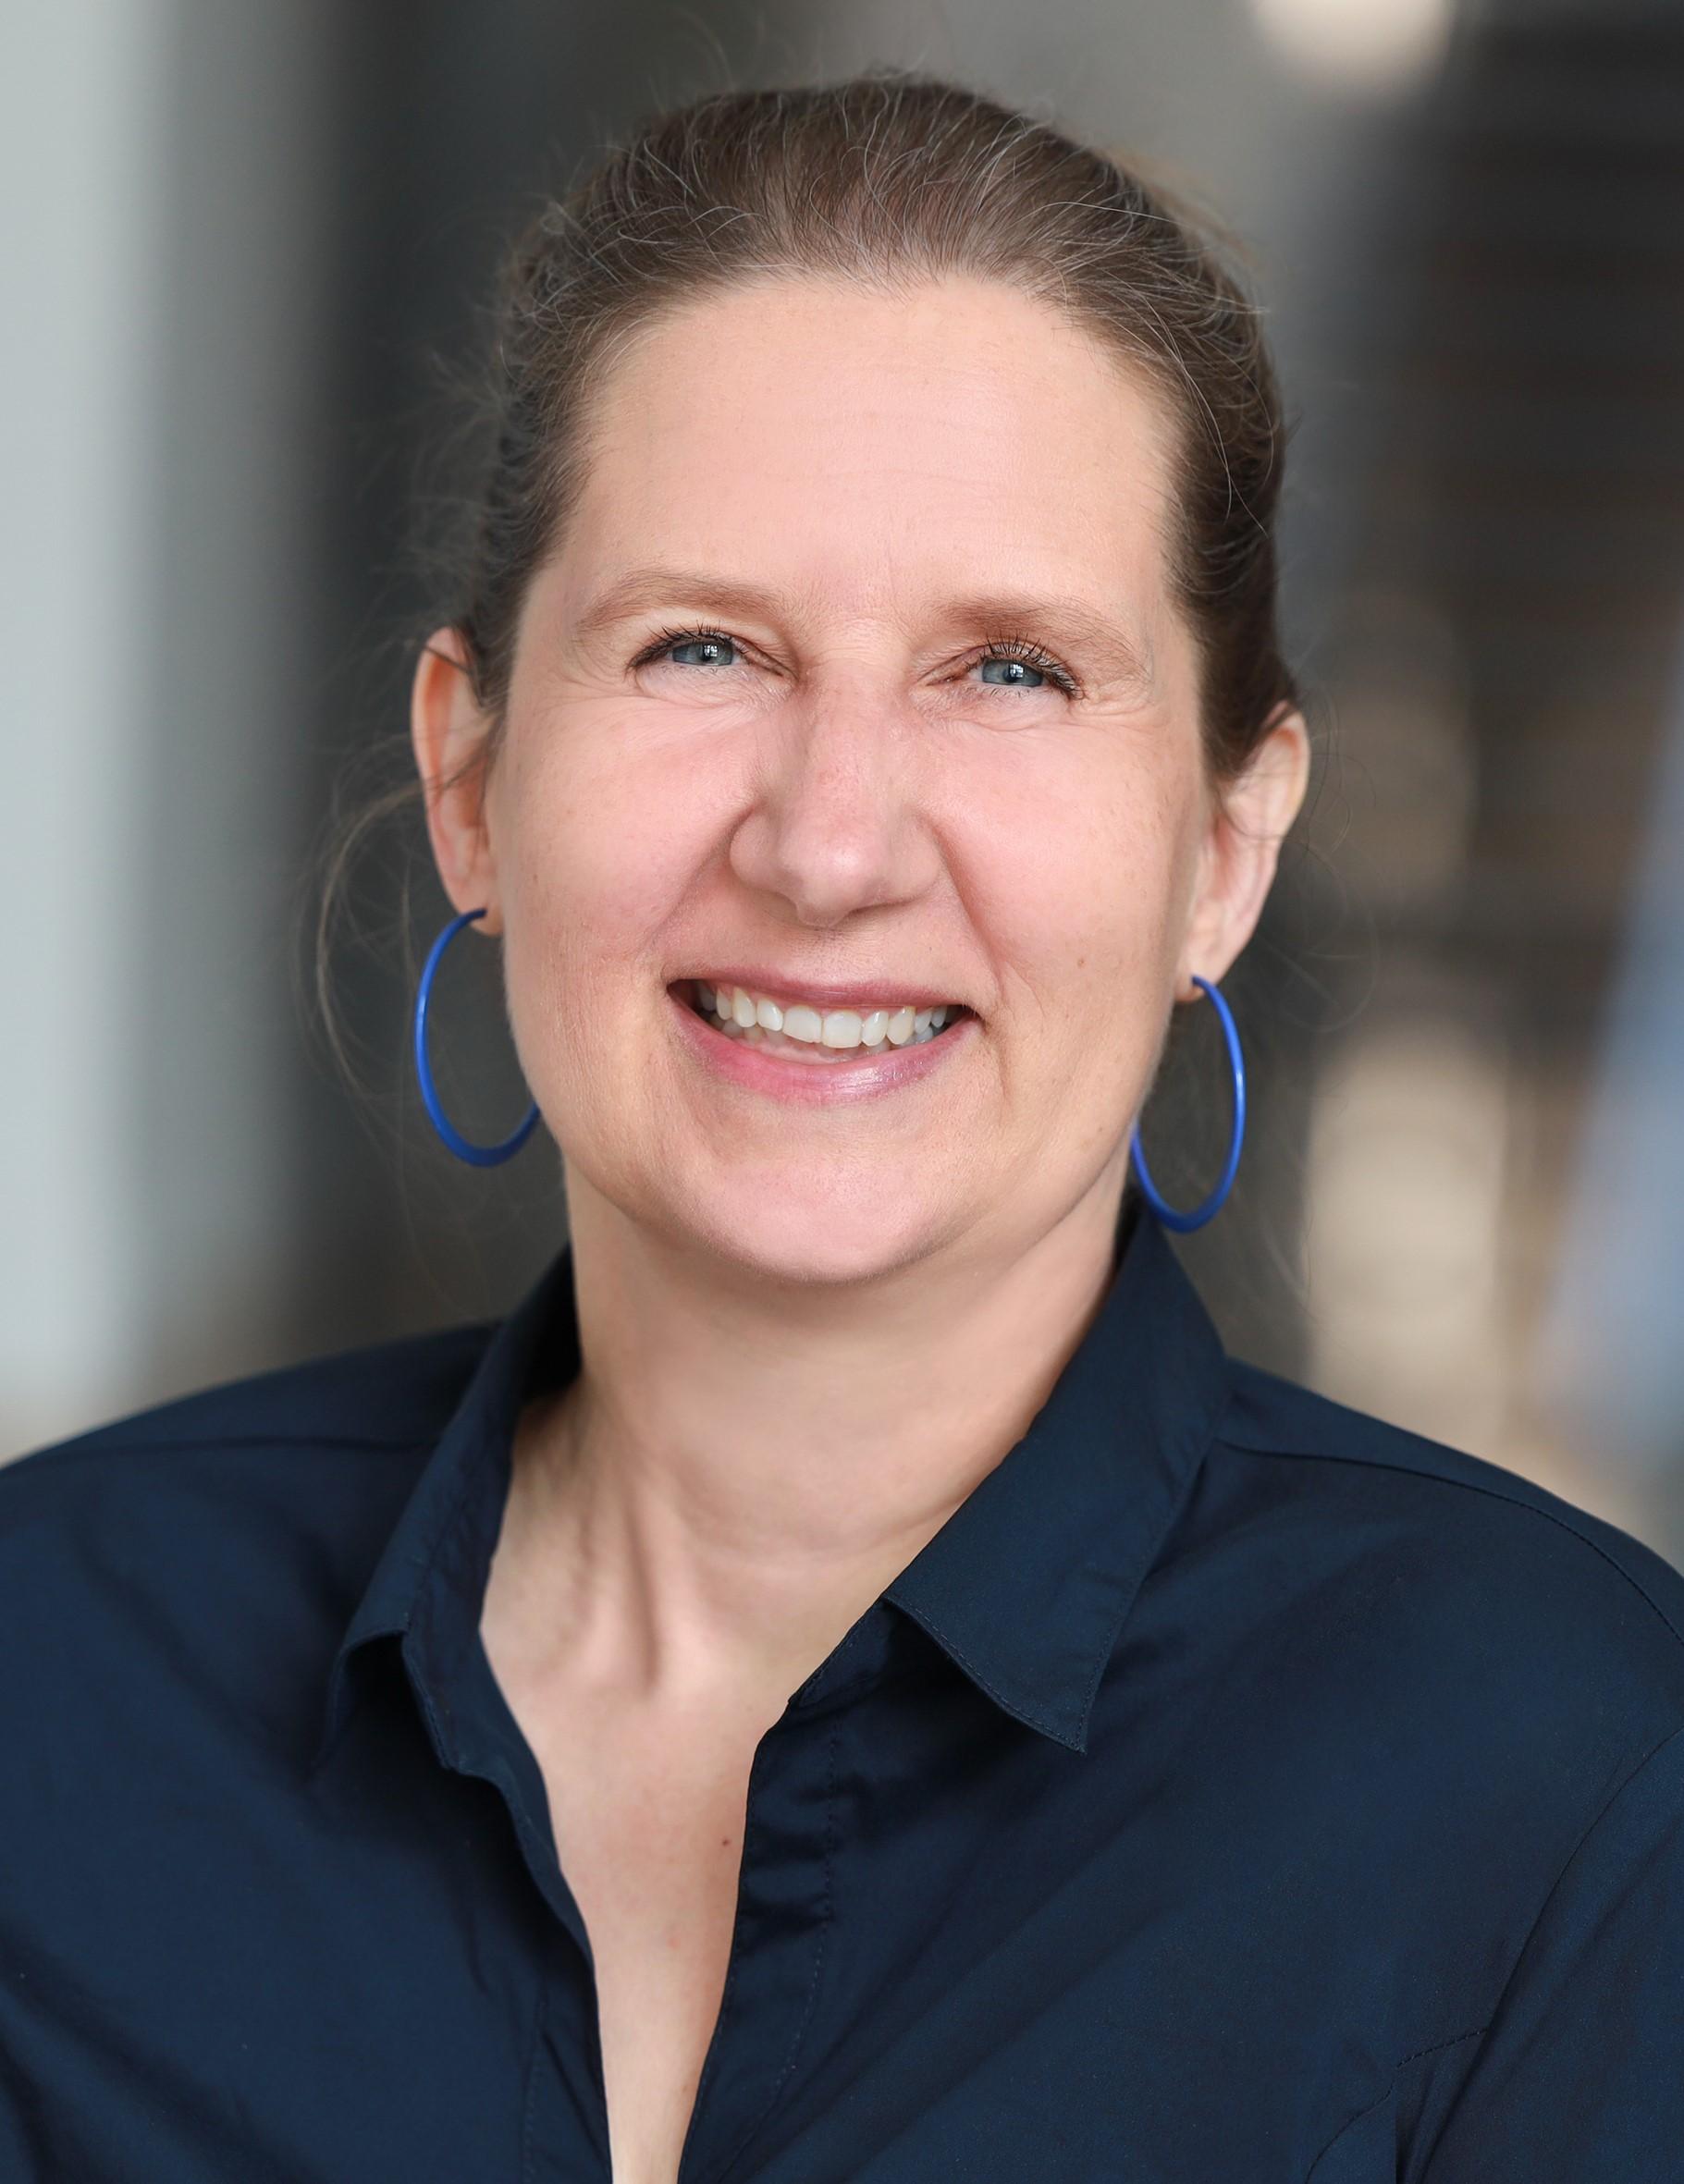 Bilanzbuchhalterin Natascha Weber